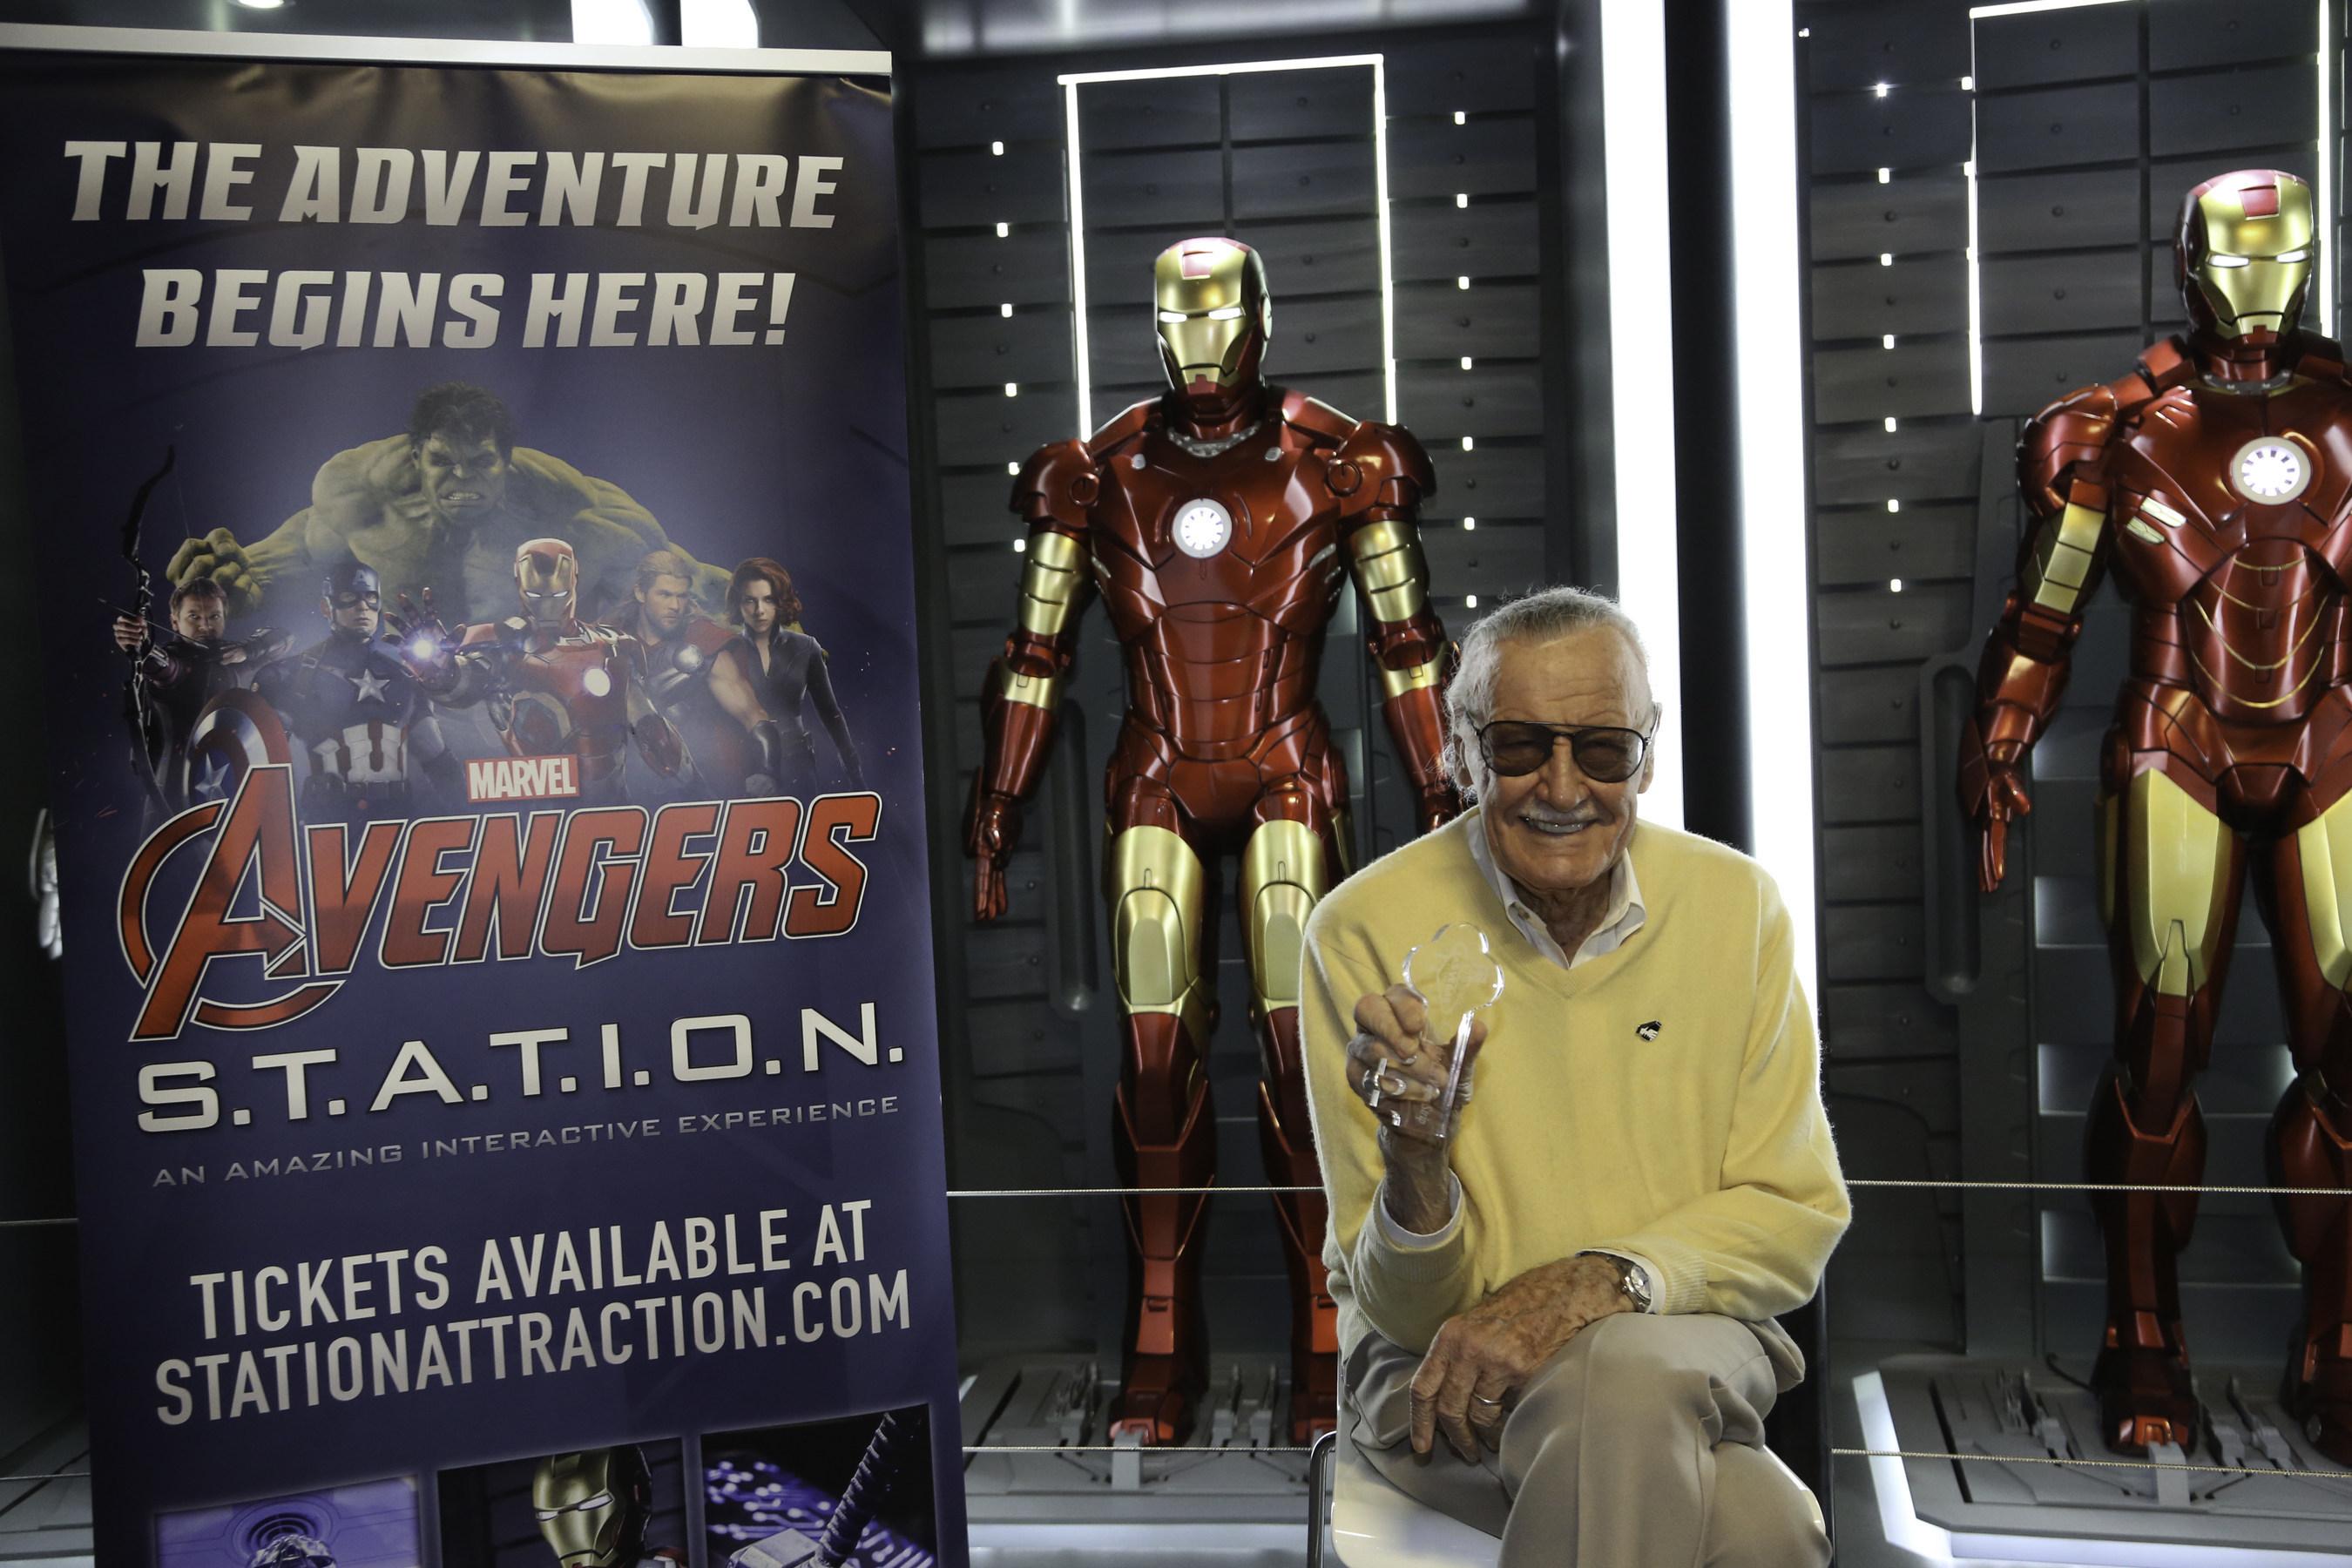 Stan Lee at Marvel Avengers S.T.A.T.I.O.N. inside Treasure Island